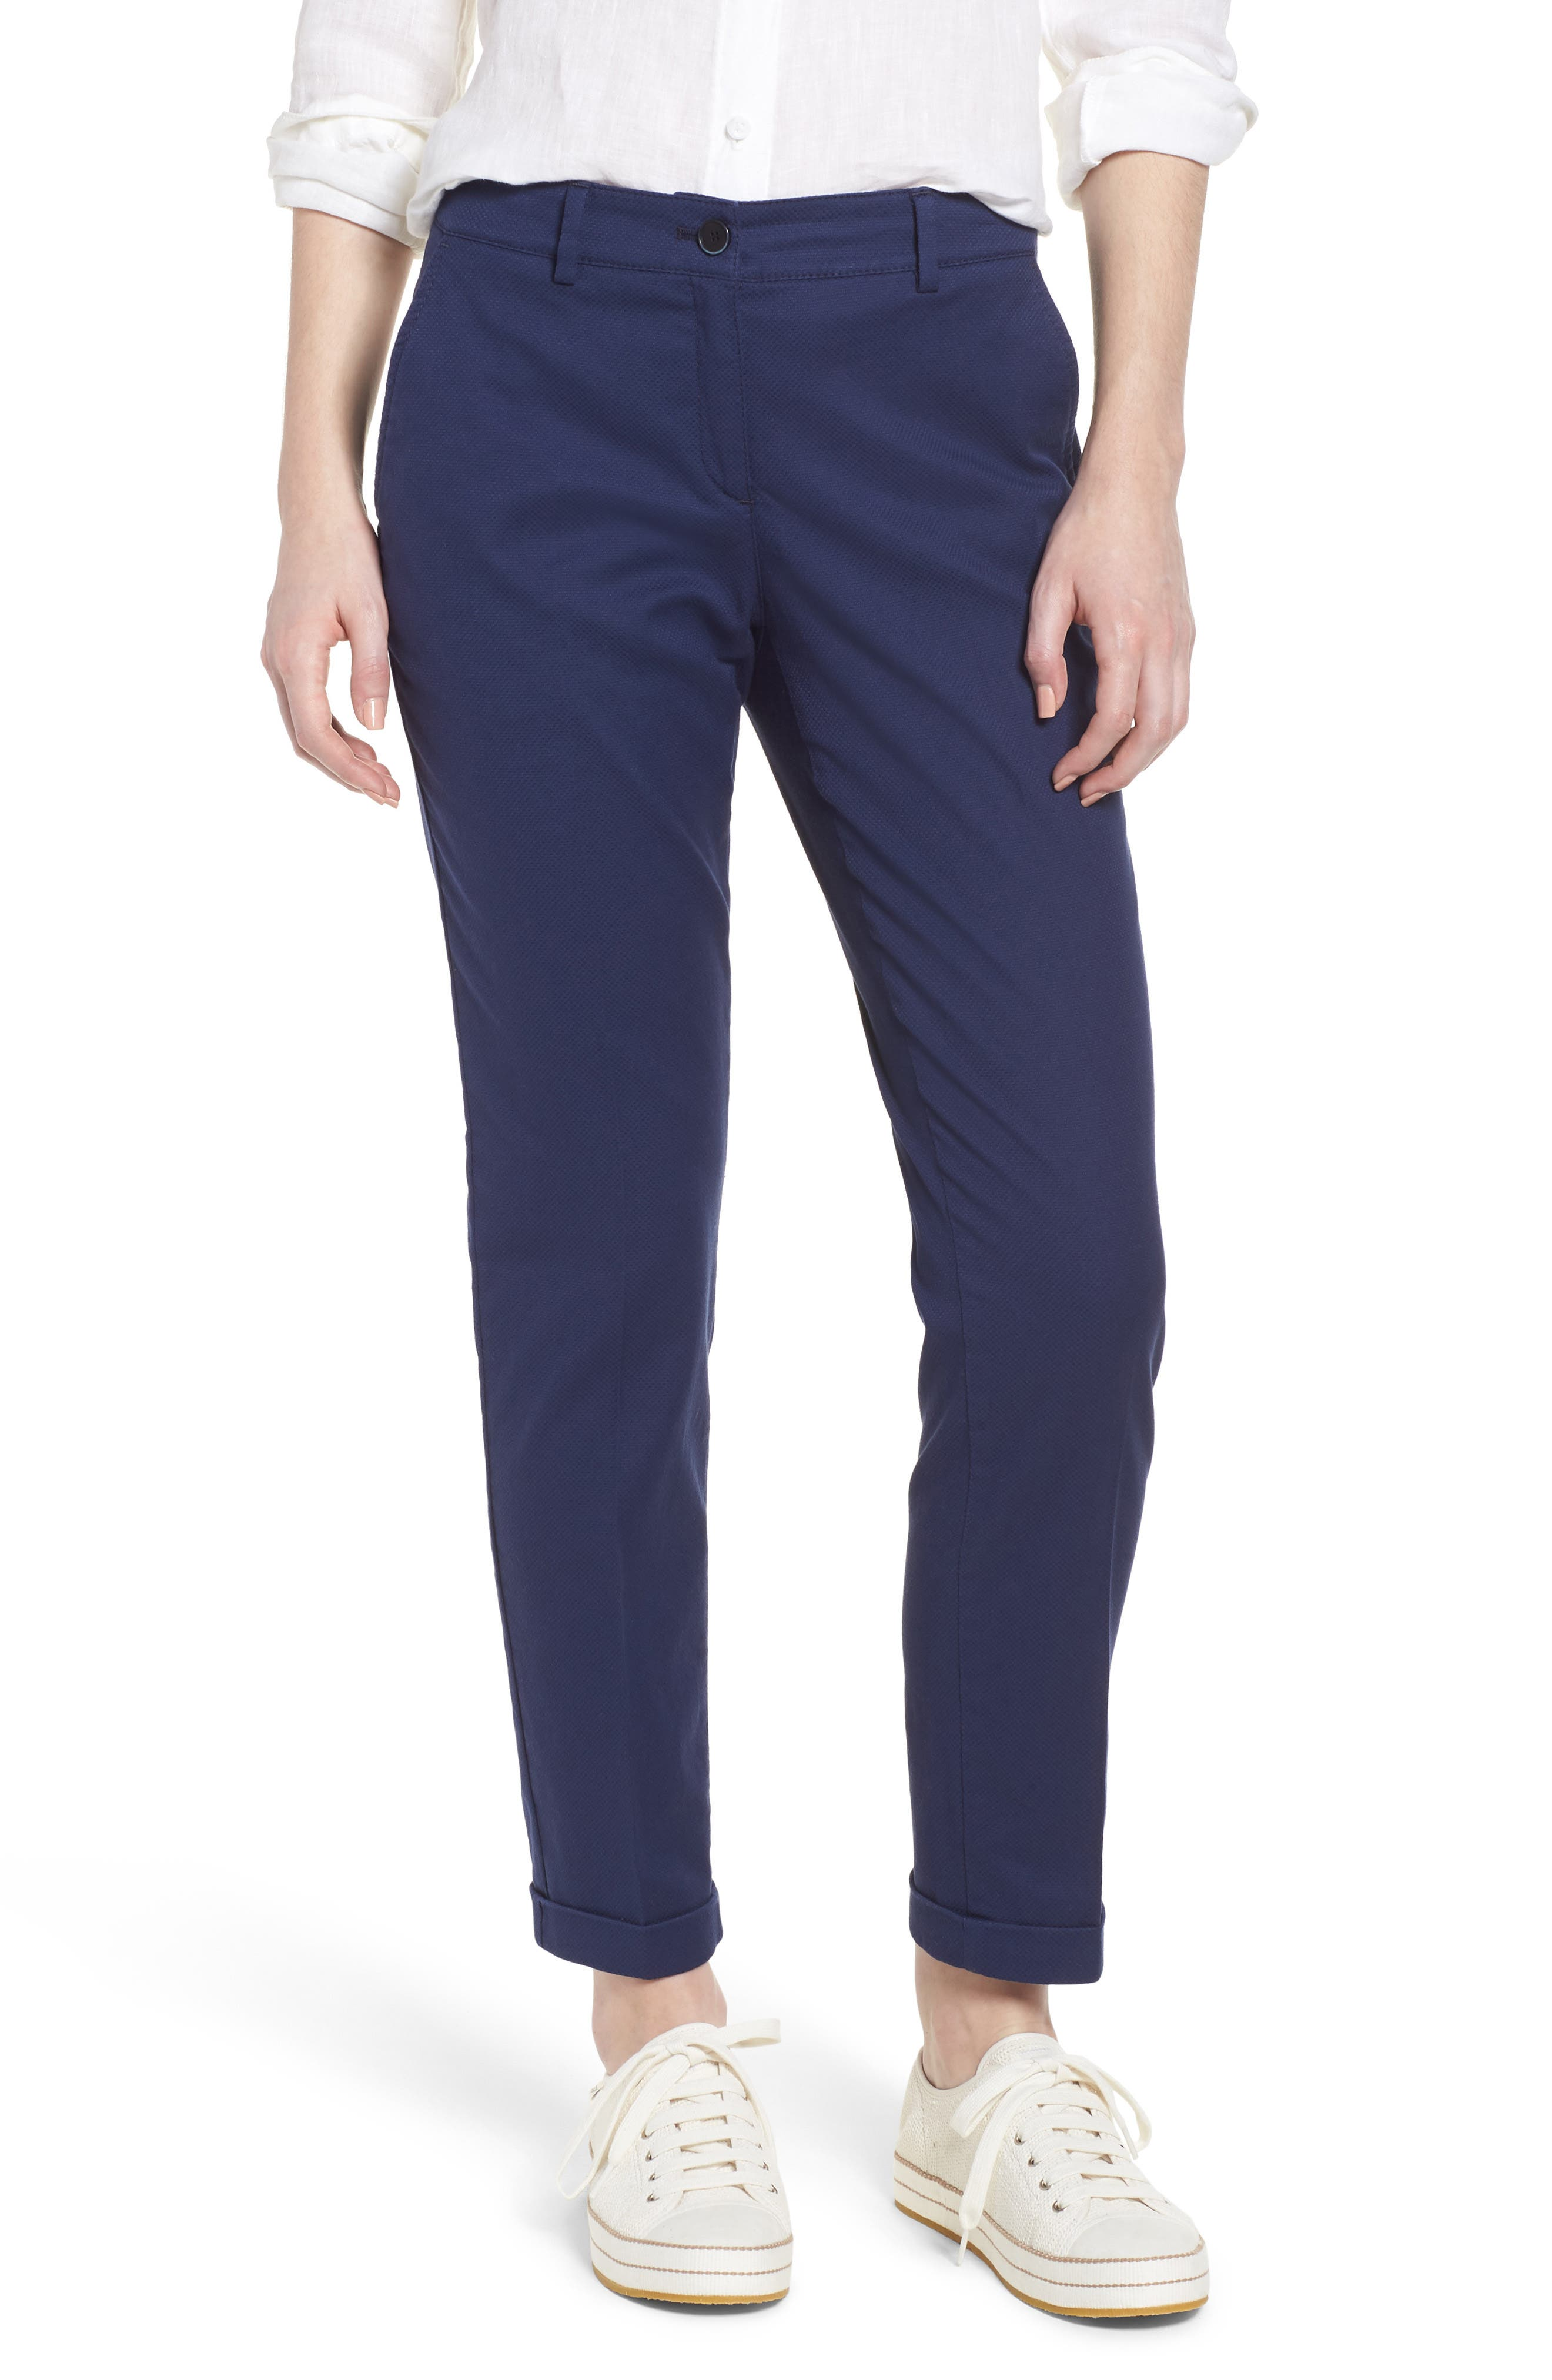 Maron Cuffed Straight Leg Pants,                         Main,                         color, 422